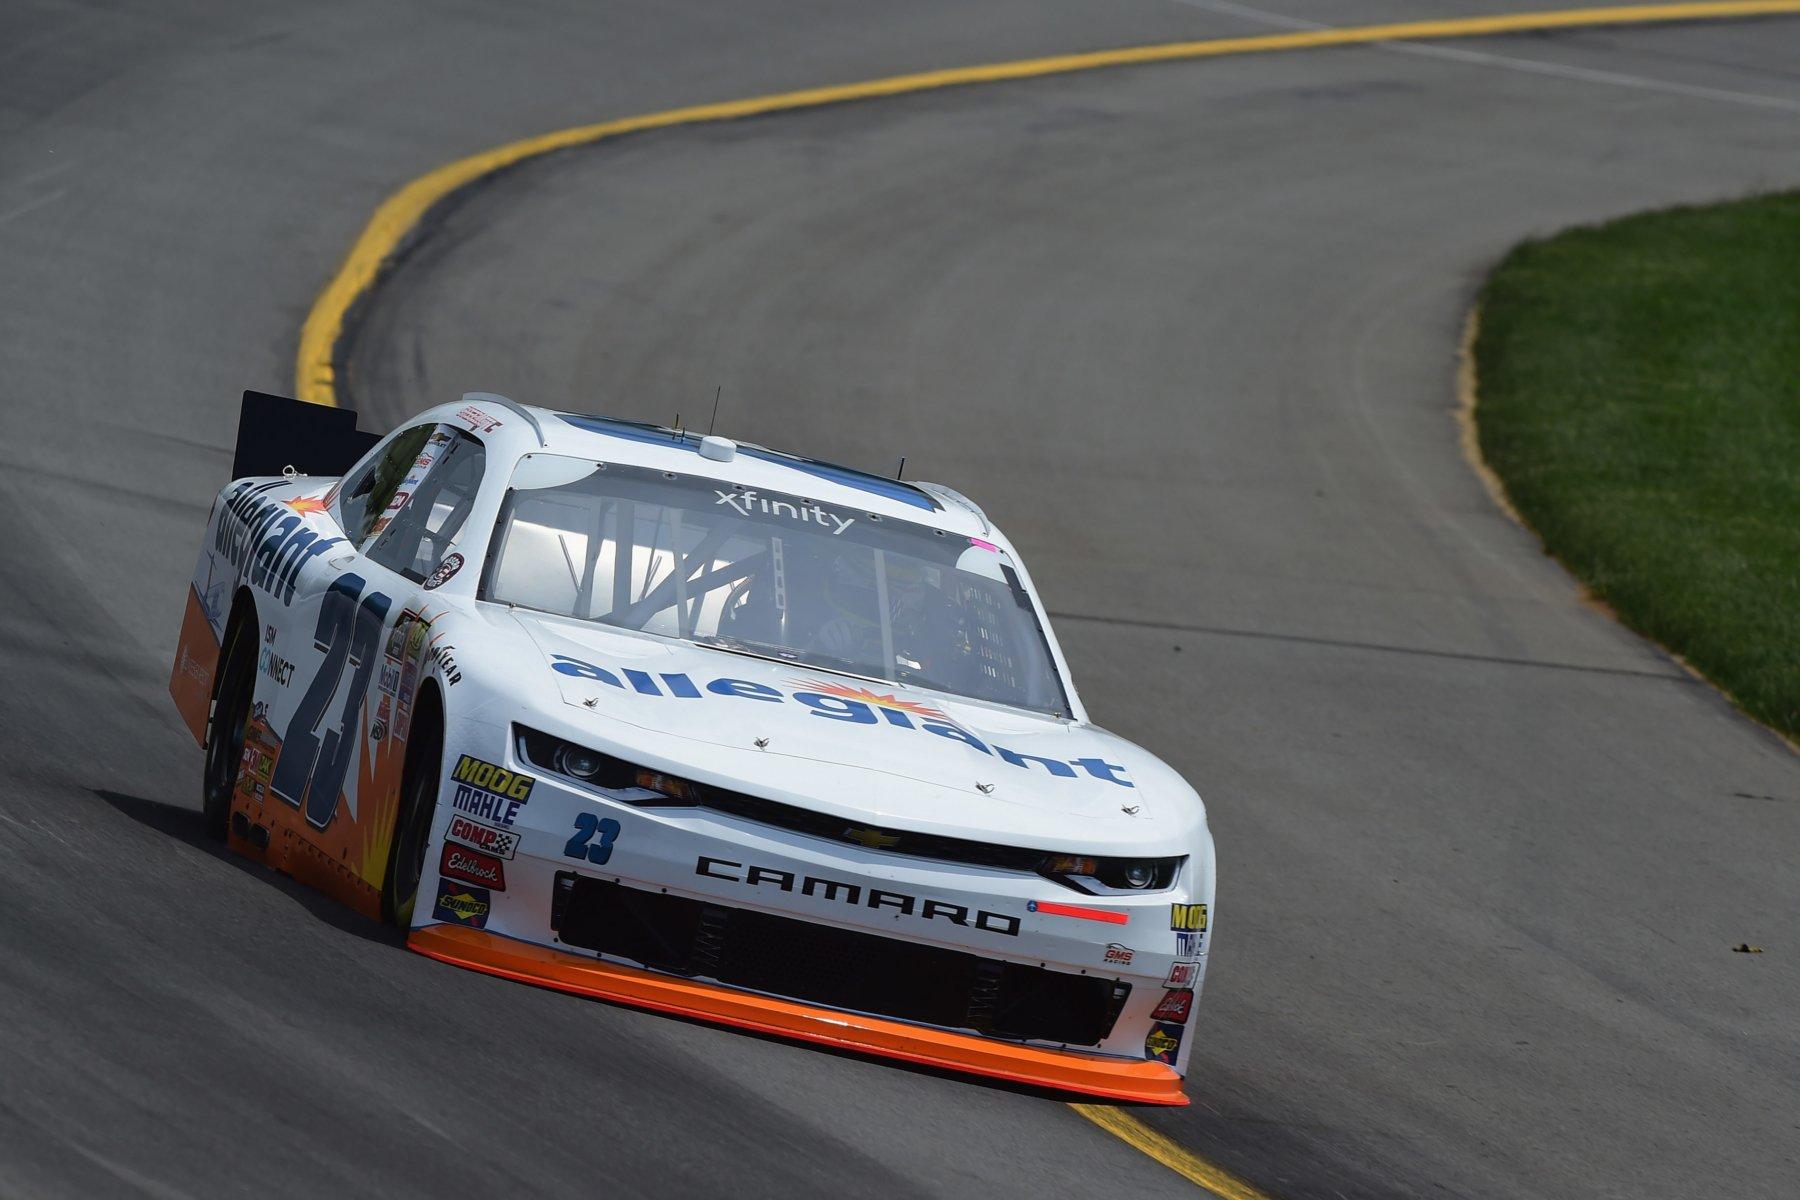 Chase Elliott at Pocono Raceway in the NASCAR Xfinity Series #23